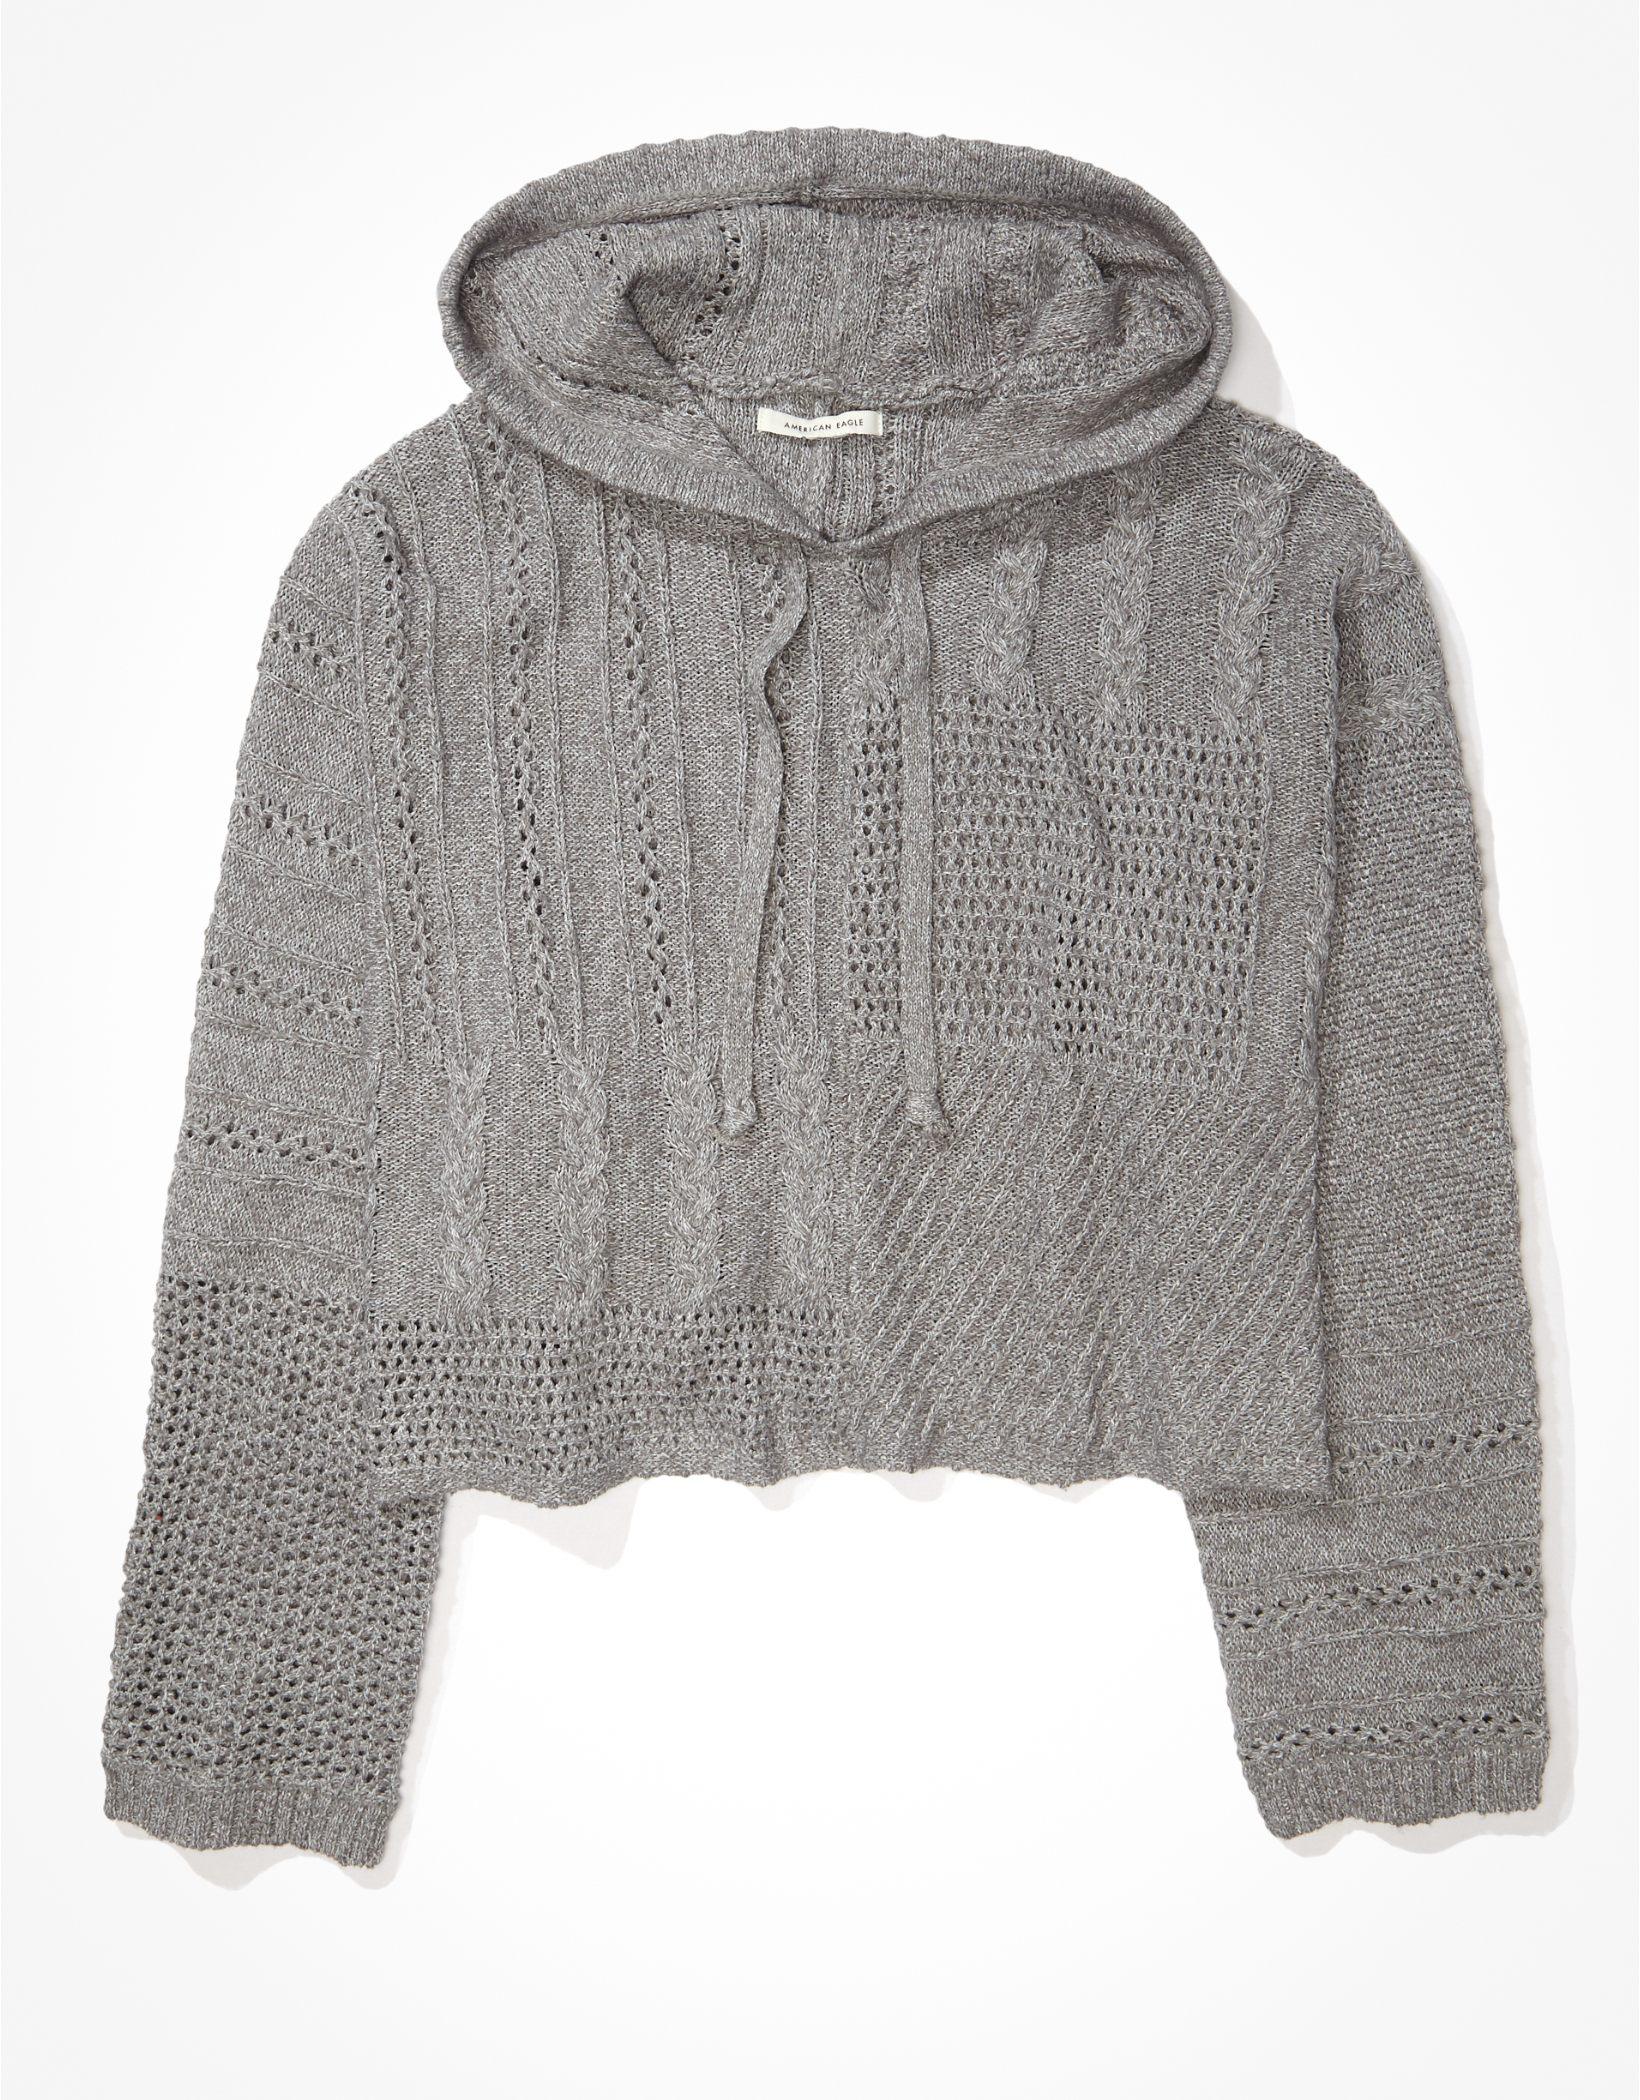 AE Mix Stitch Hooded Sweater